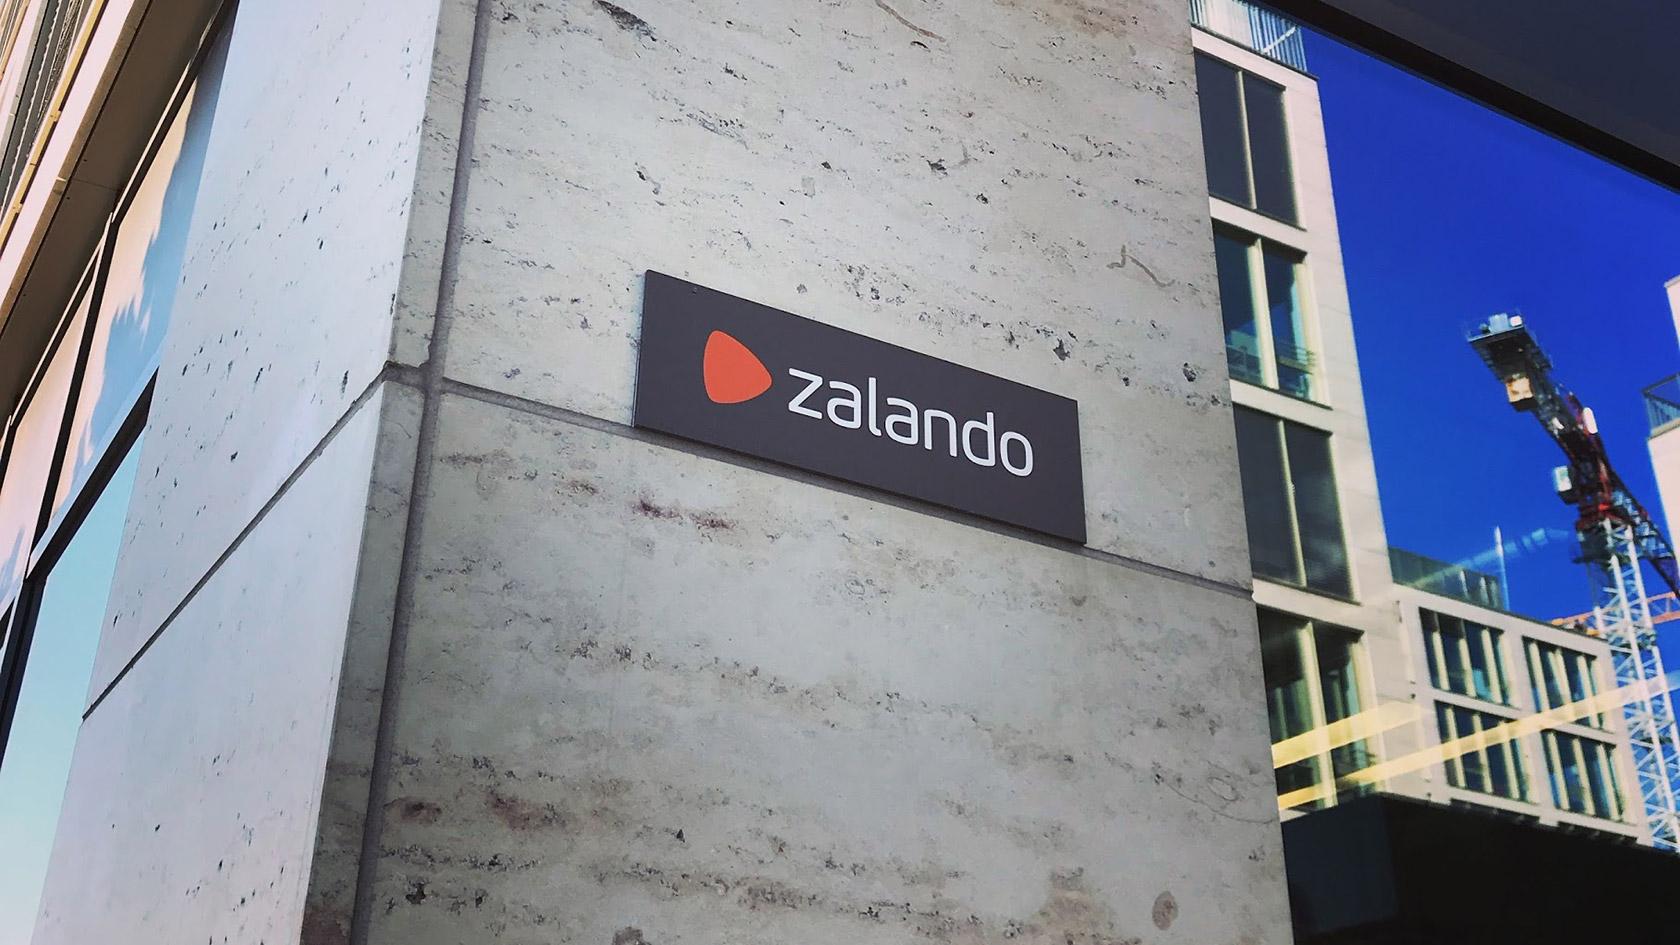 Copy of Zalando digital product